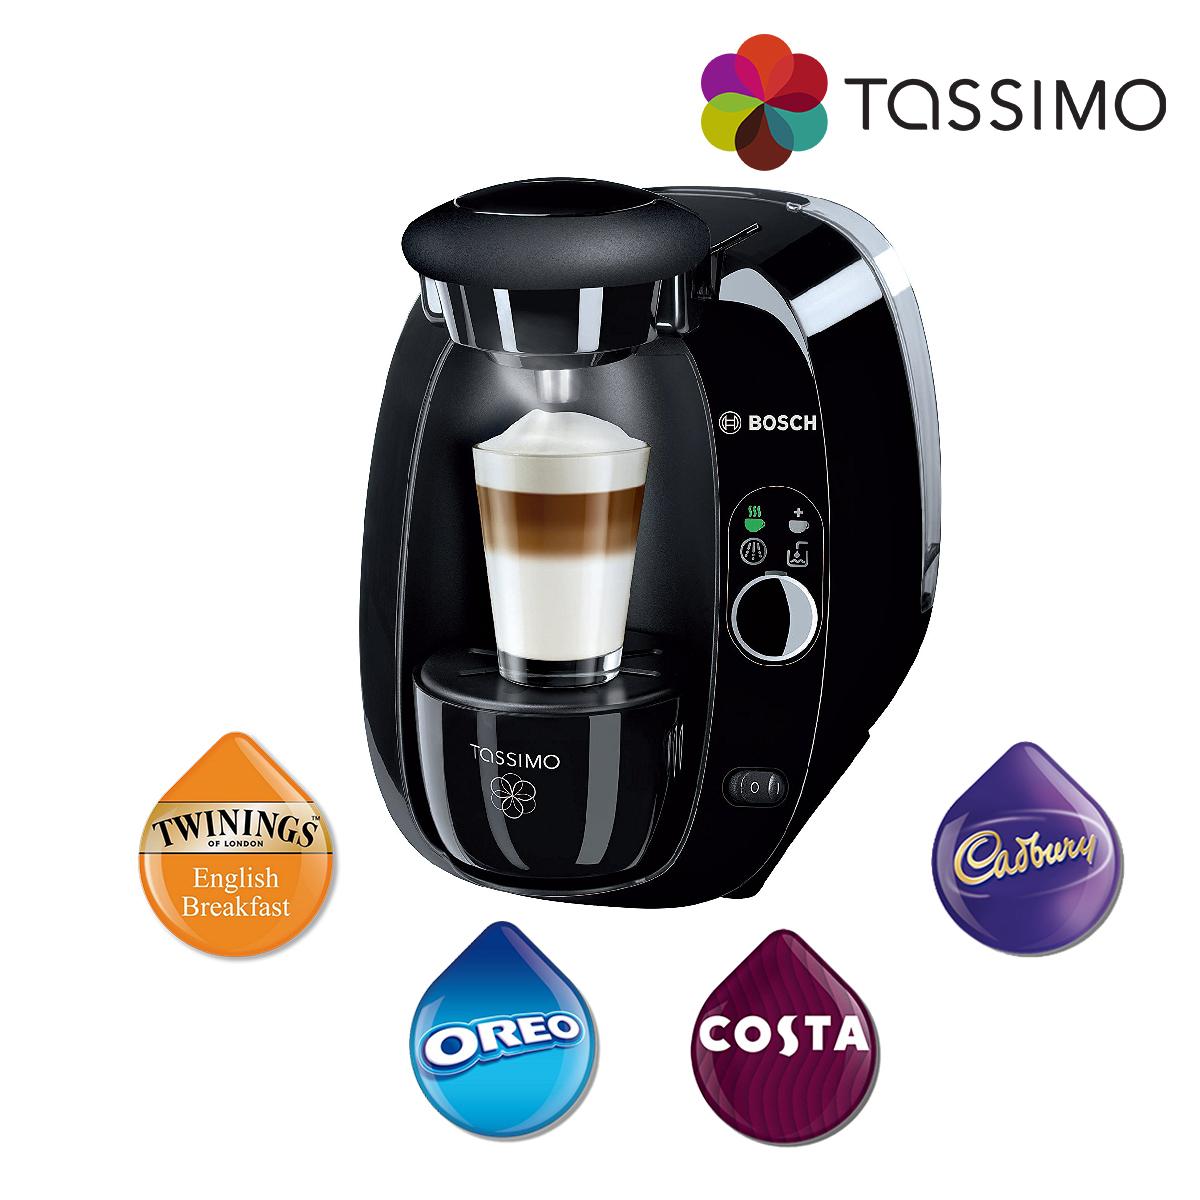 tassimo tas2002gb amia costa coffee hot drinks machine. Black Bedroom Furniture Sets. Home Design Ideas